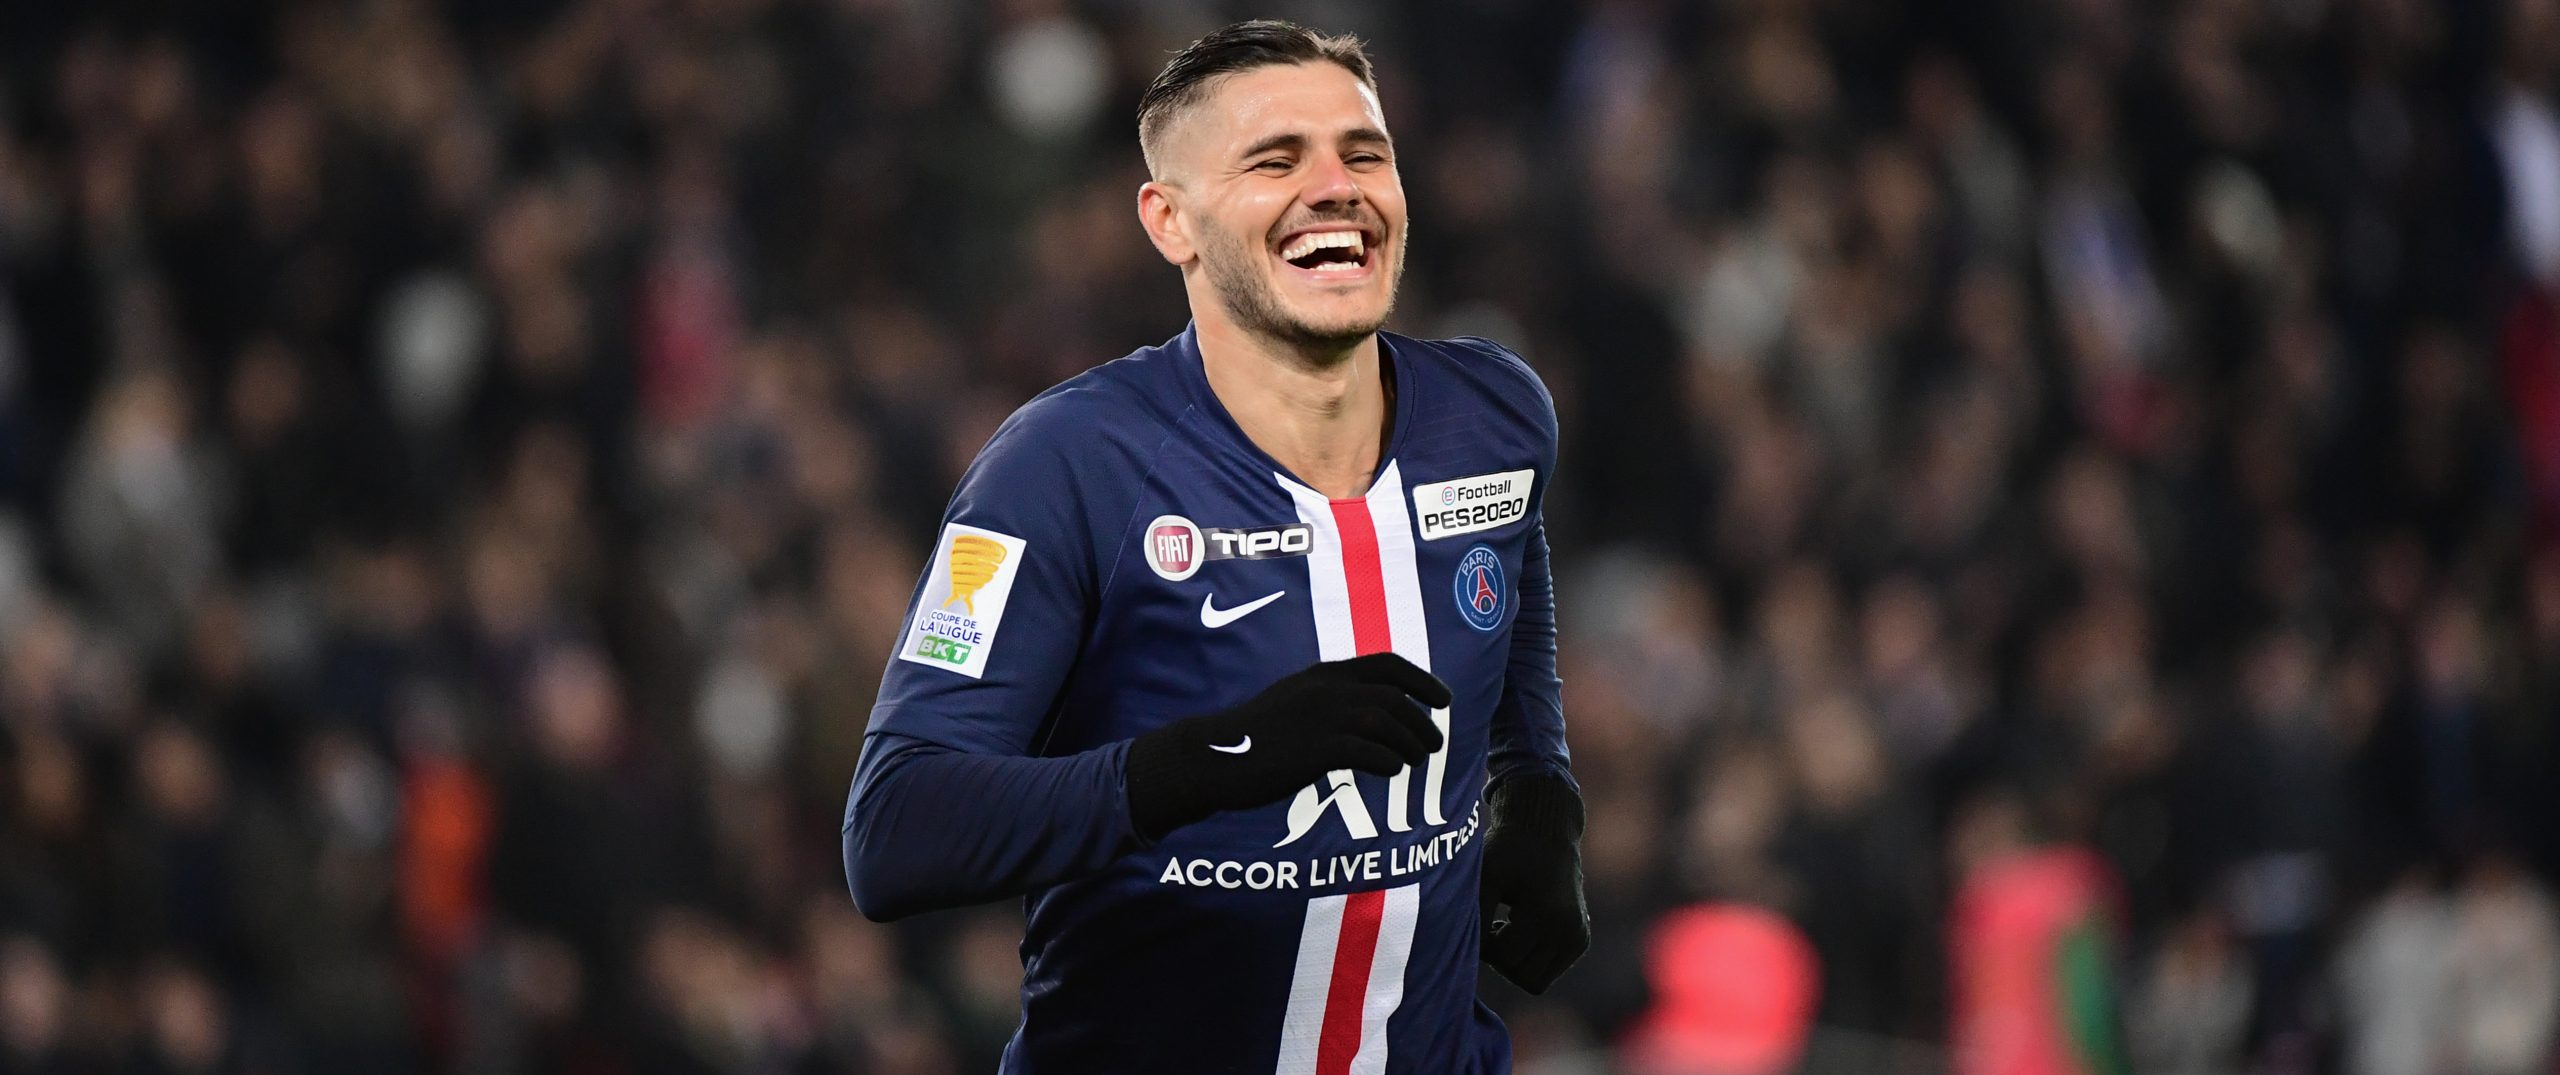 Paris-Saint-Germain---AS-Monaco---Ligue-1---Mauro-Icardi---betFIRST